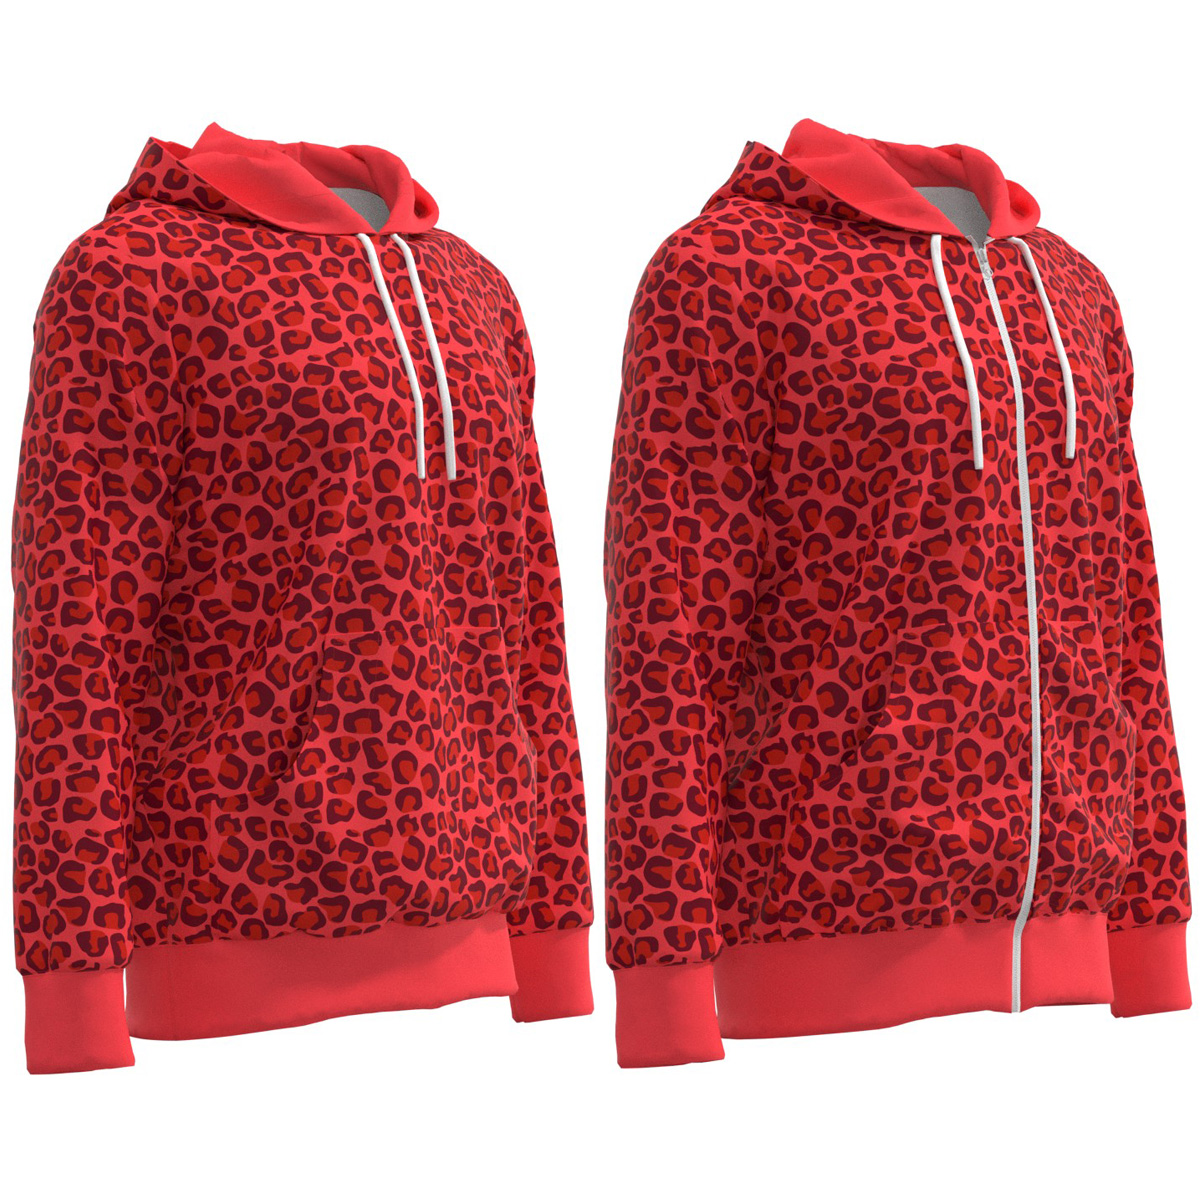 Bright Leopard Print Women Zip Up Hoodie xs-3xl